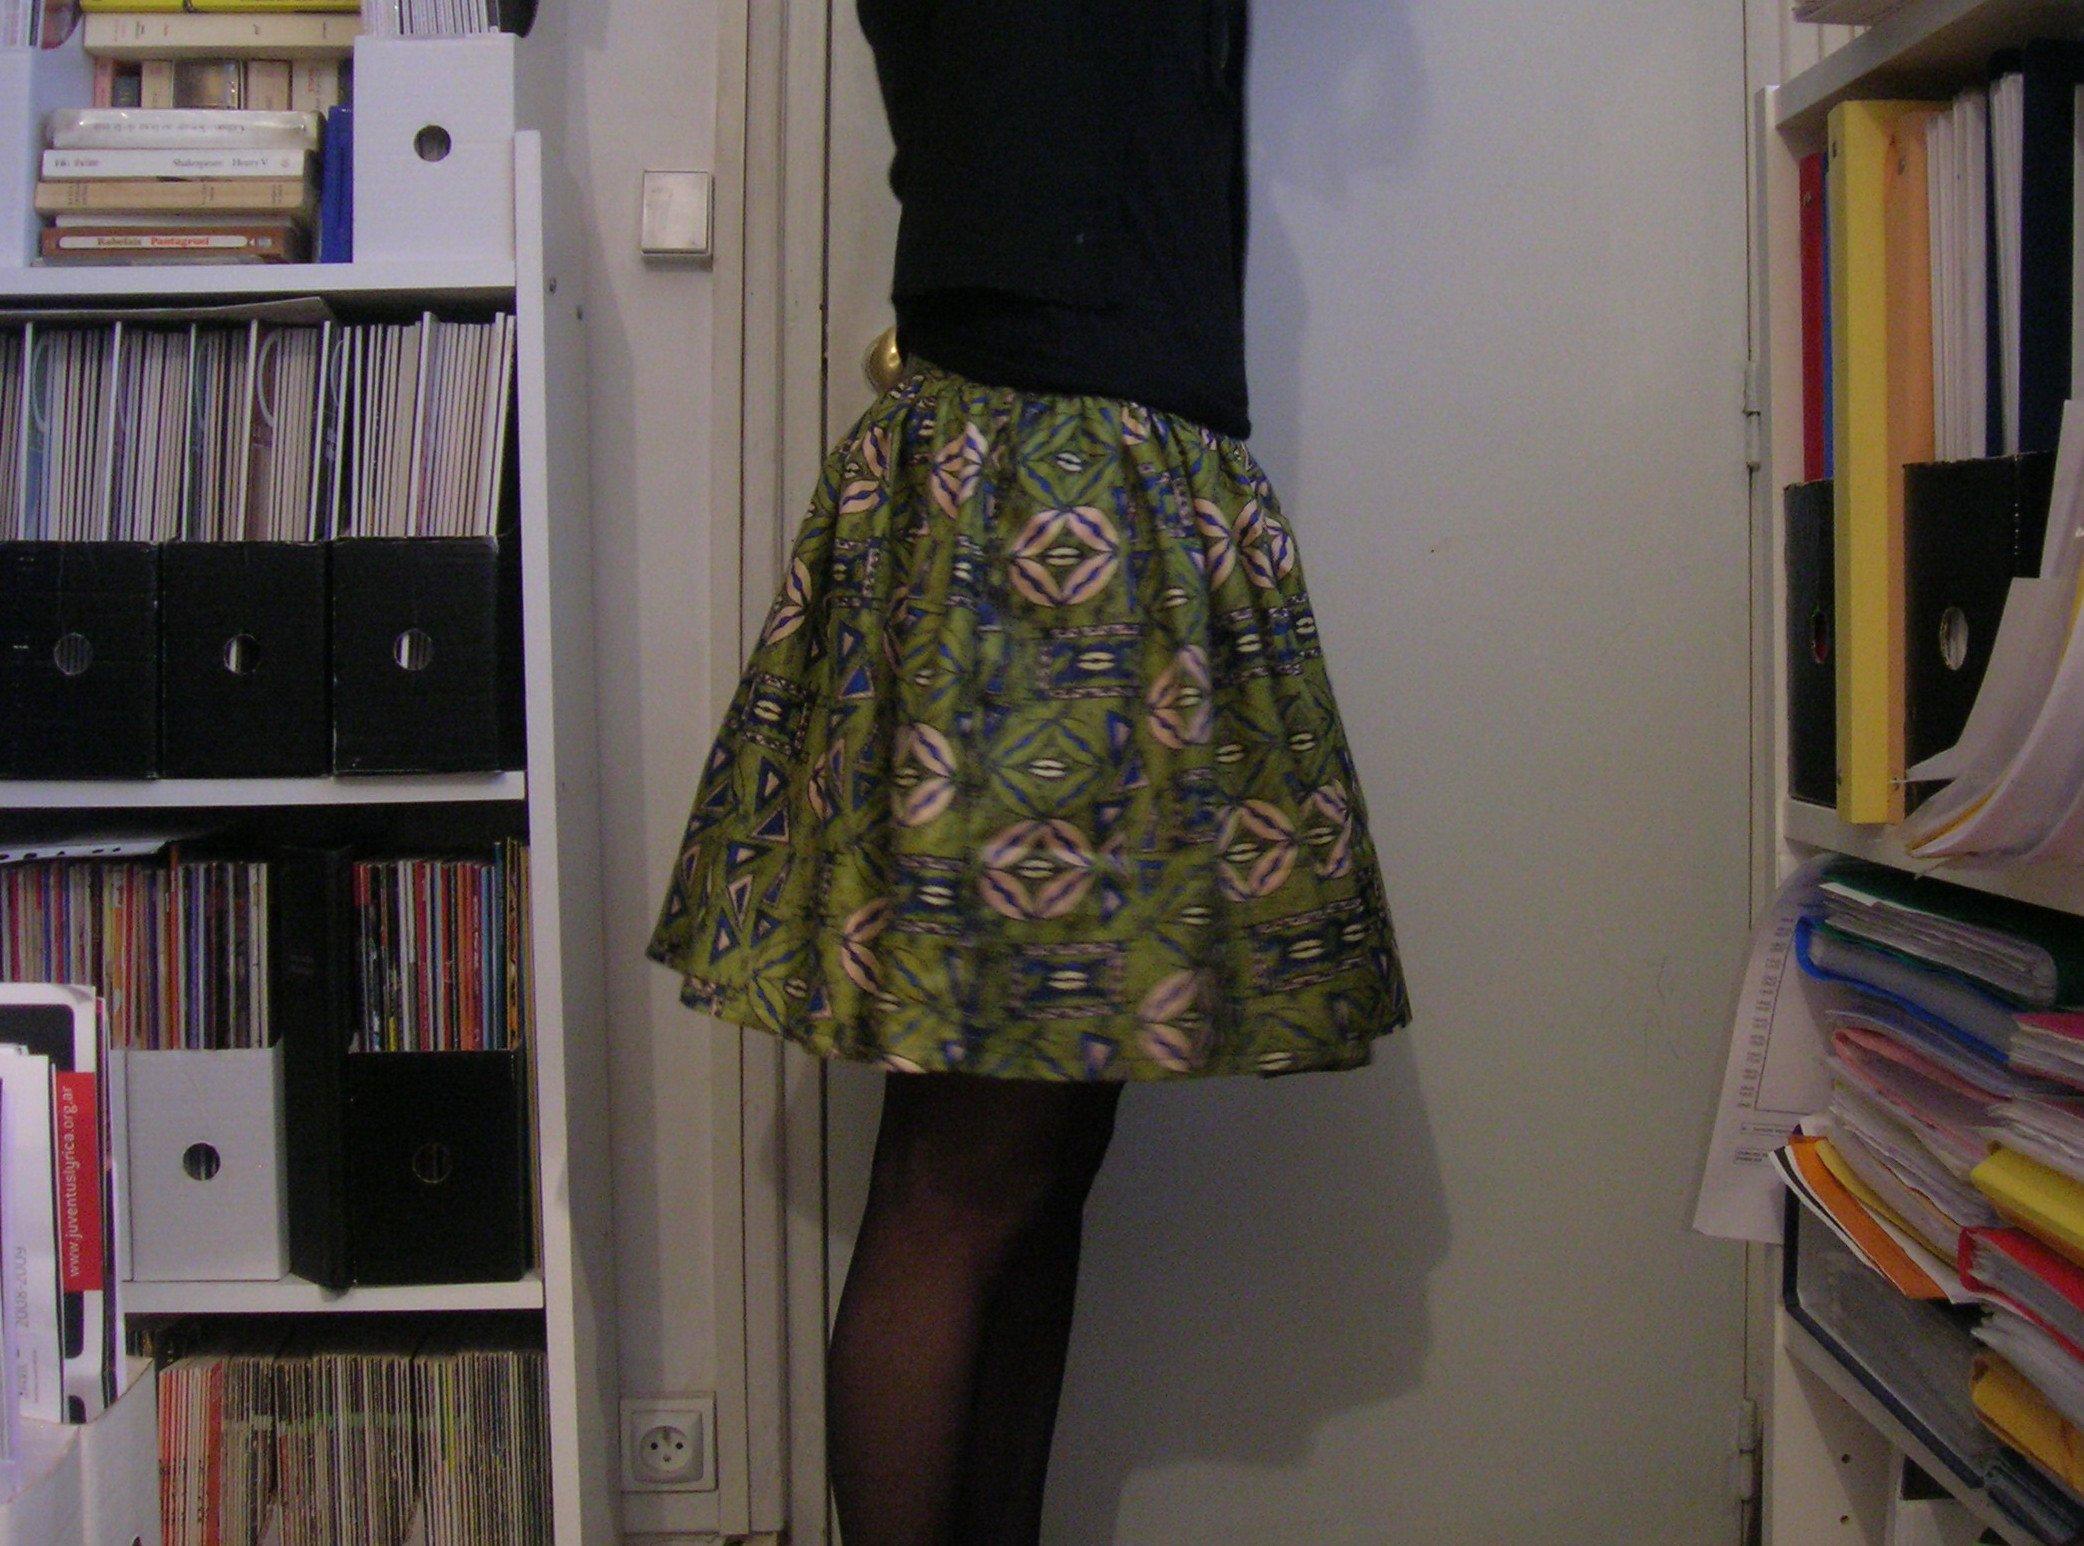 La jupe